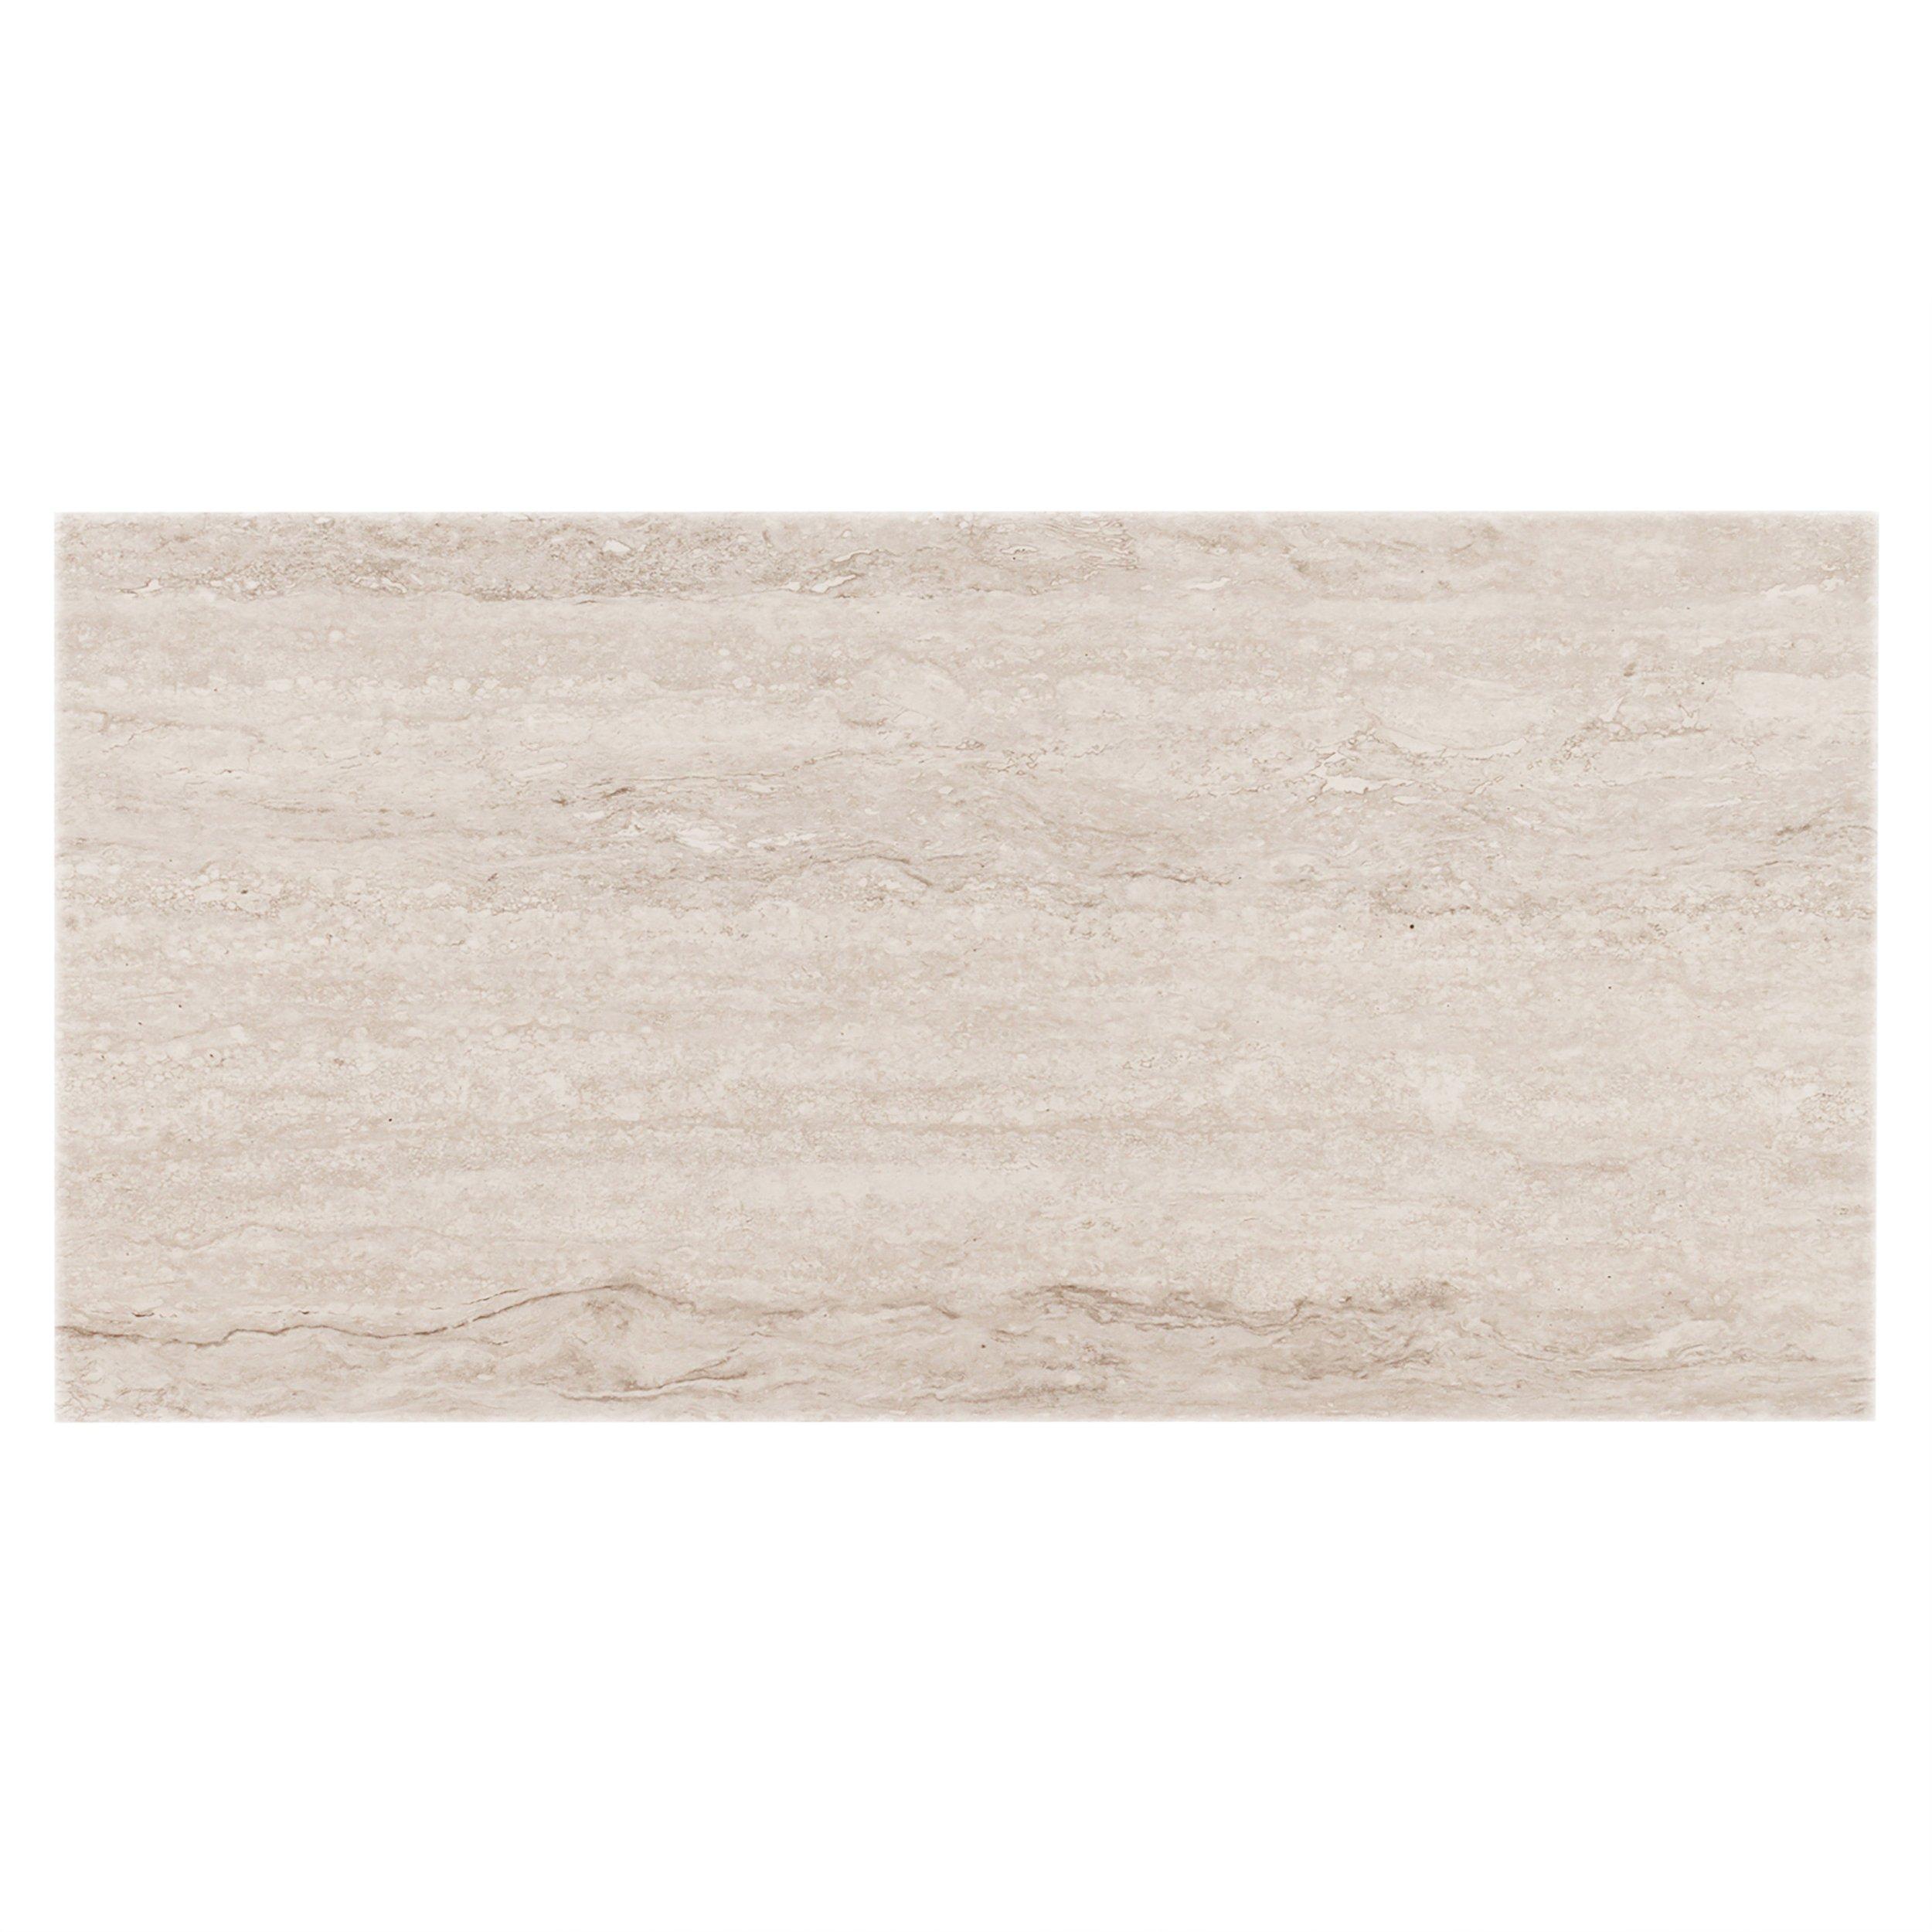 Forum Ivory Porcelain Bullnose 3 X 24 100047133